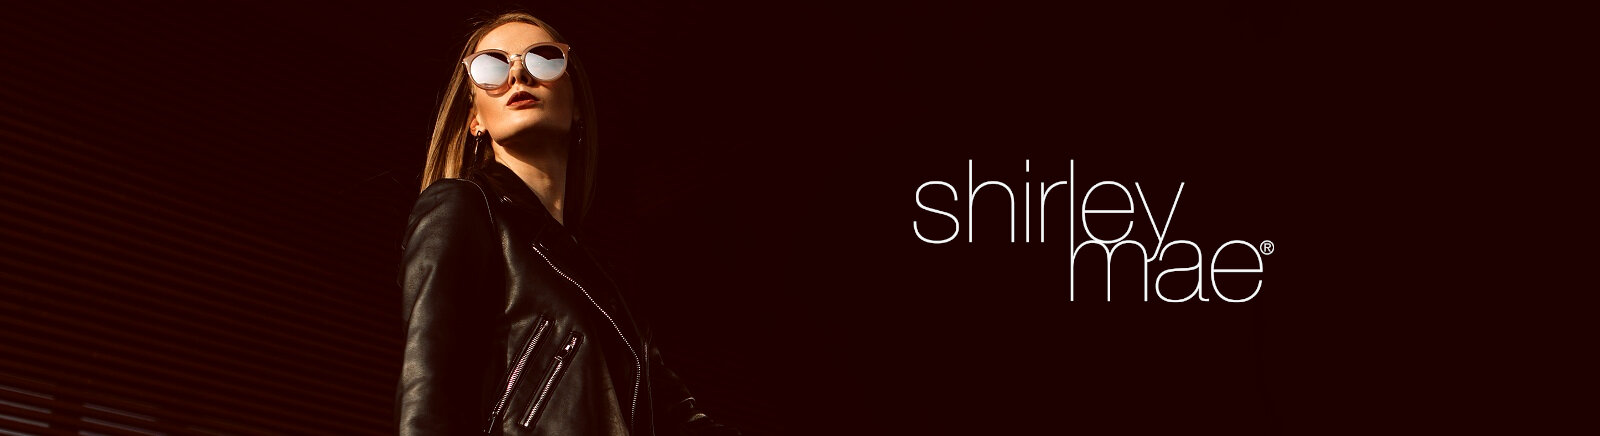 Gisy: Shirley Mae Damenschuhe online shoppen